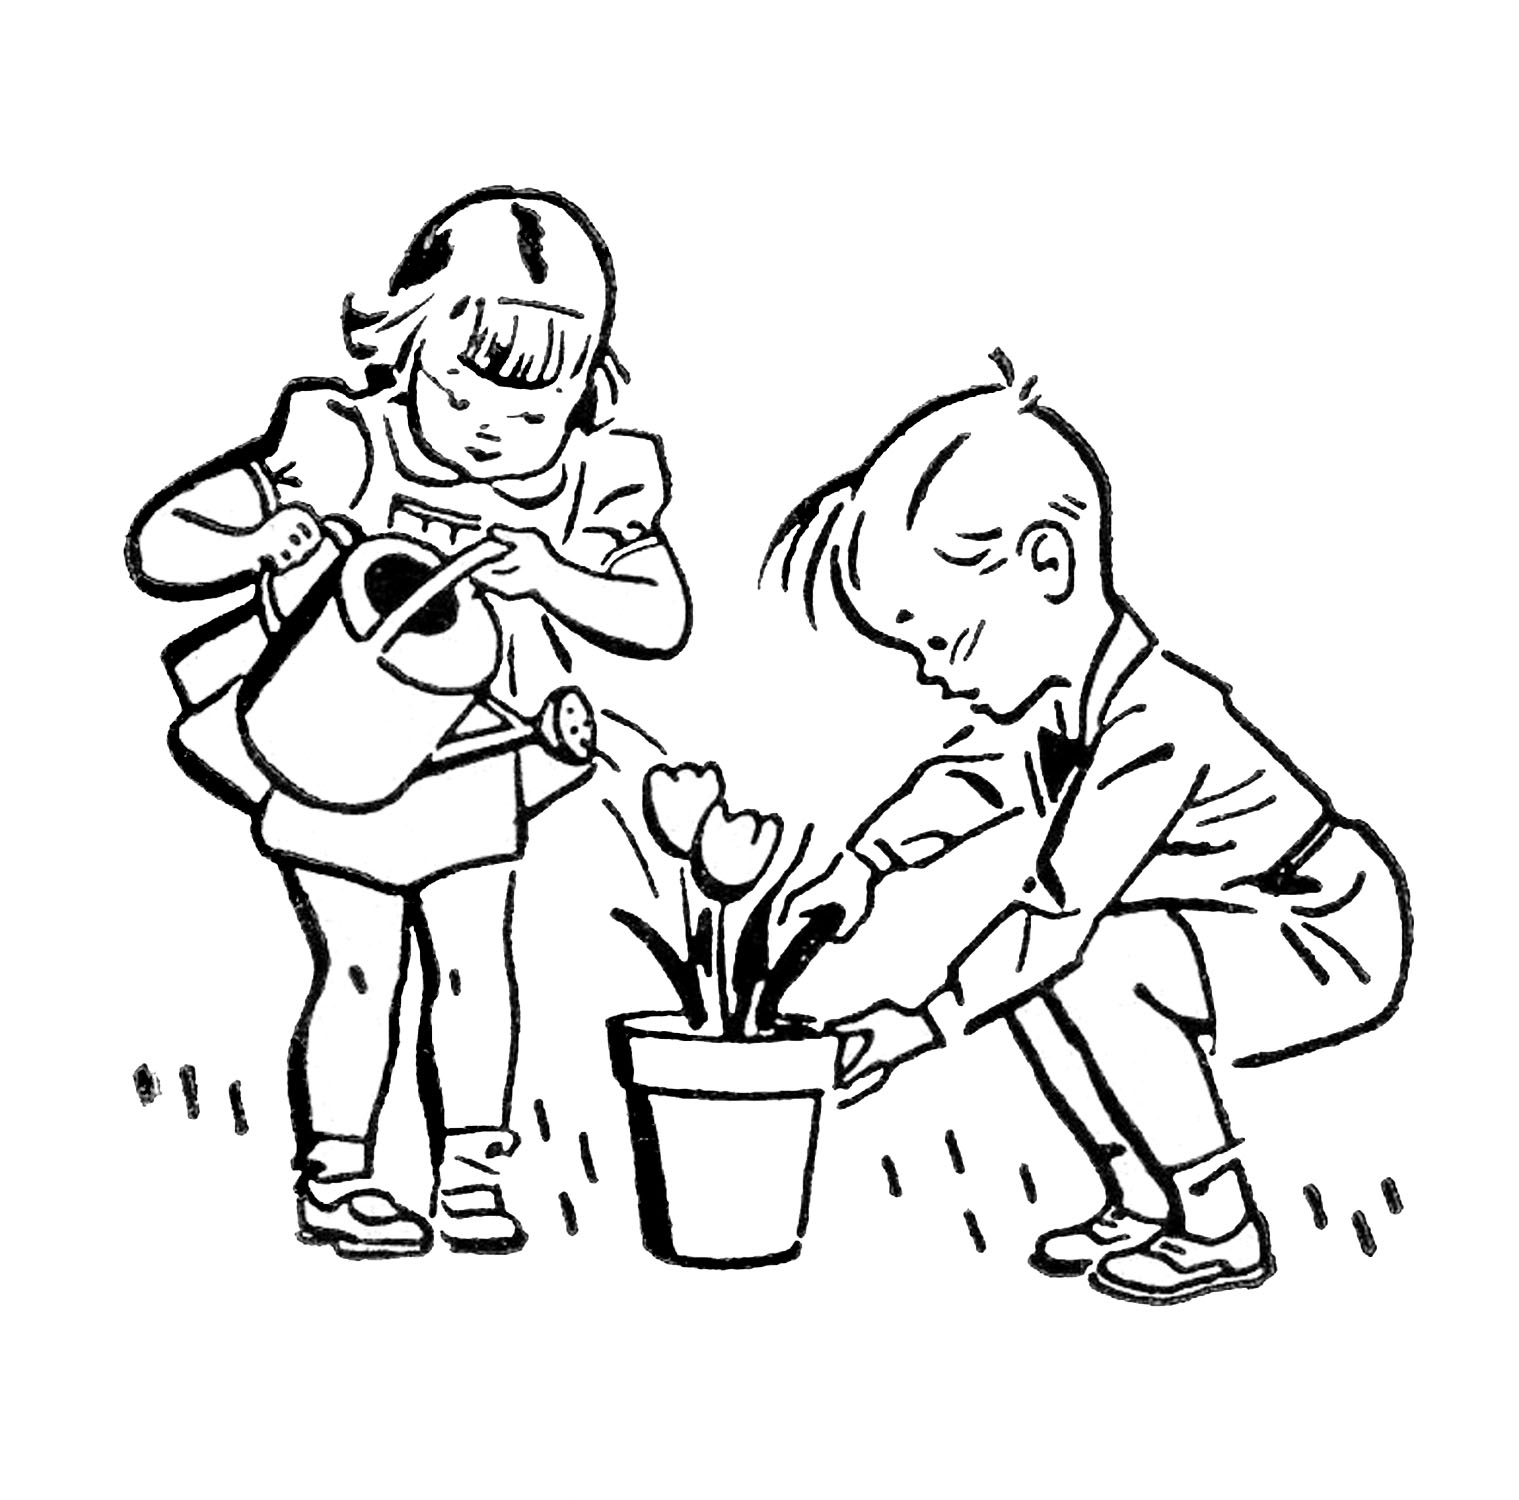 Retro Images Cute Kids Gardening Fishing-Retro Images Cute Kids Gardening Fishing Playing The-14